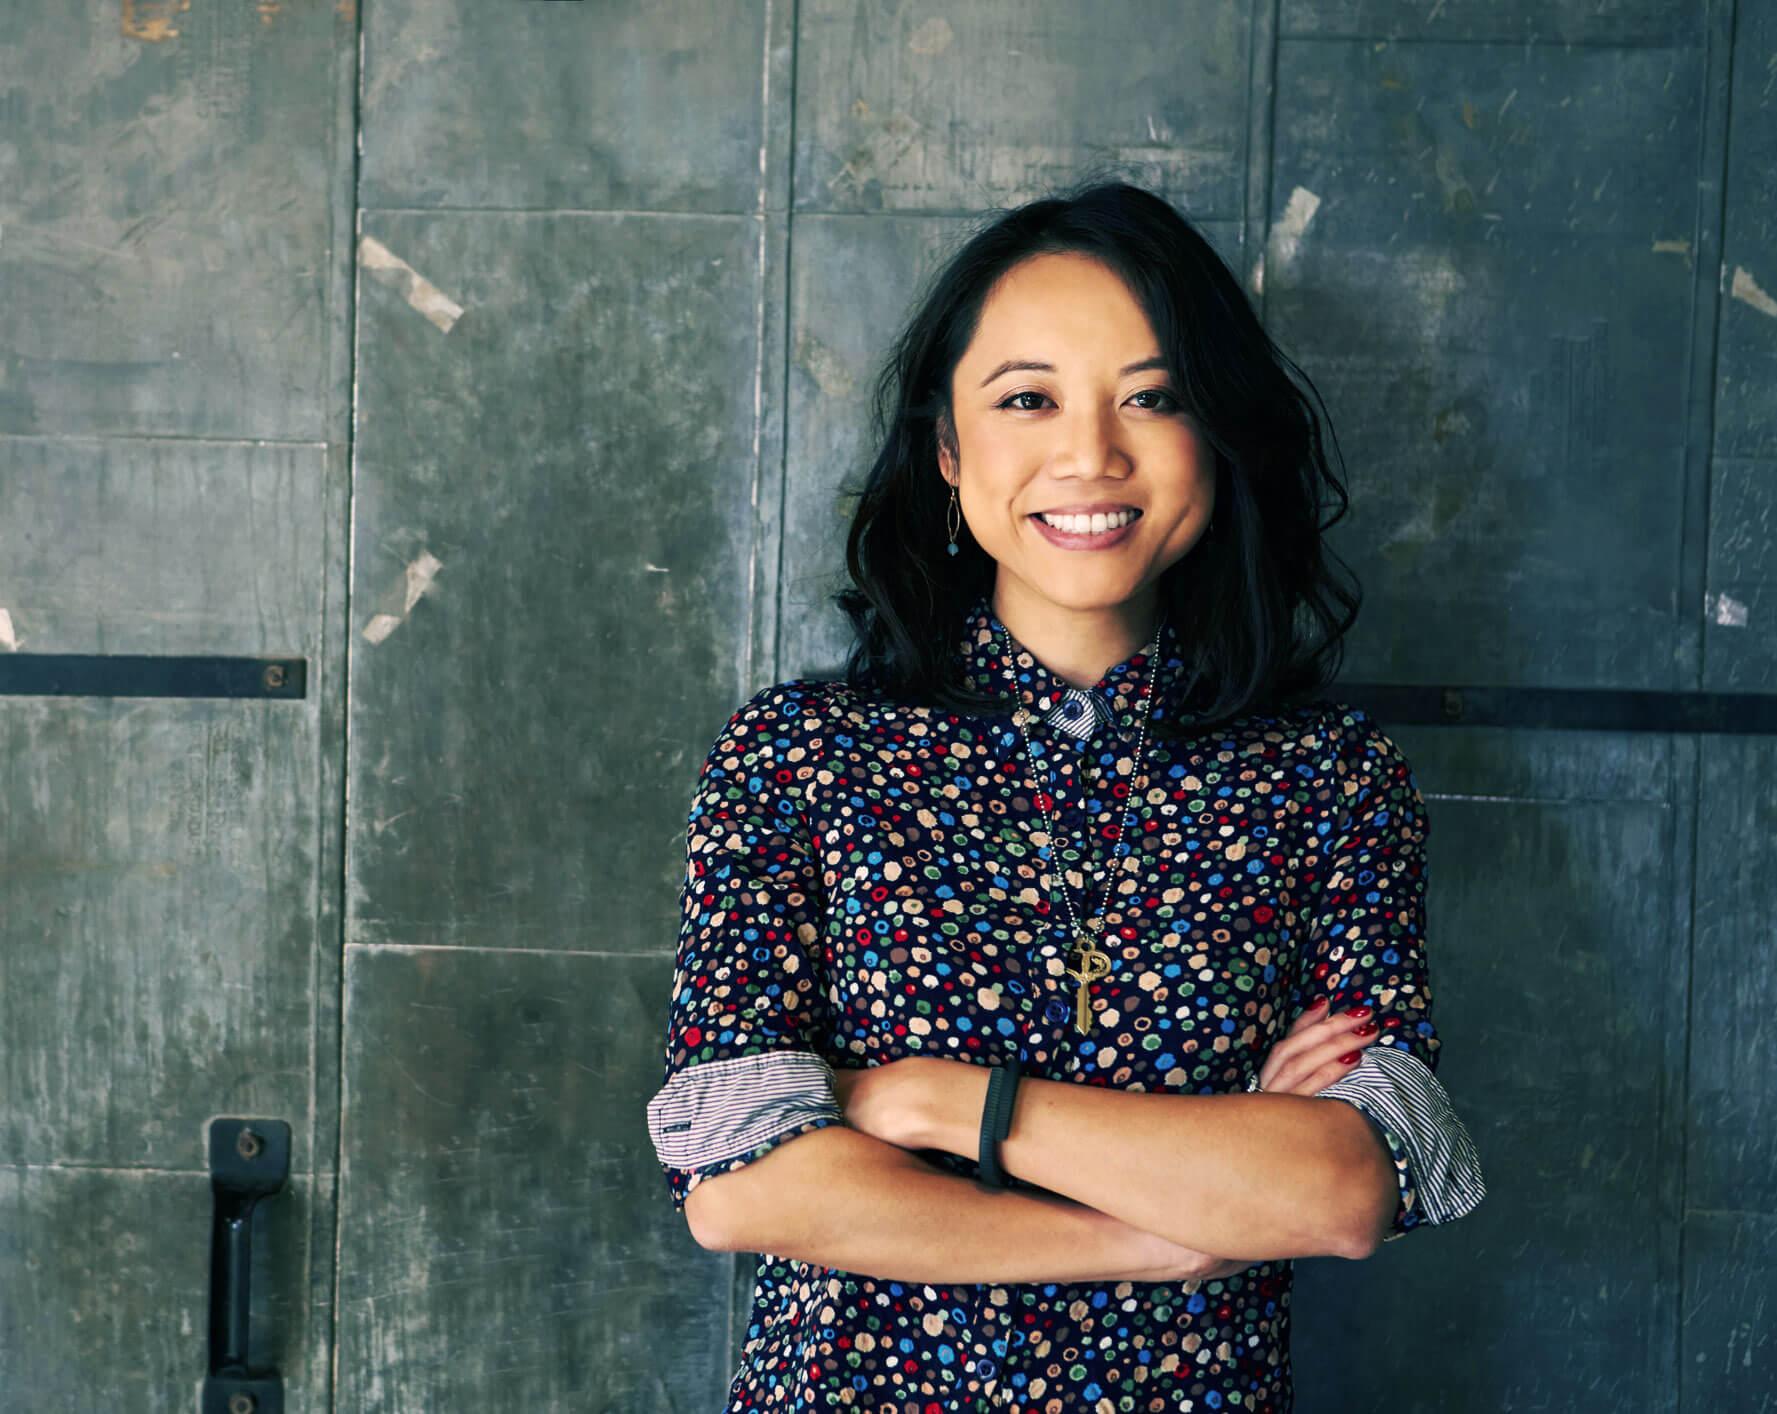 Portrait-Of-Female-Designer-Standing-In-Modern-Office-502176756_2125x1416